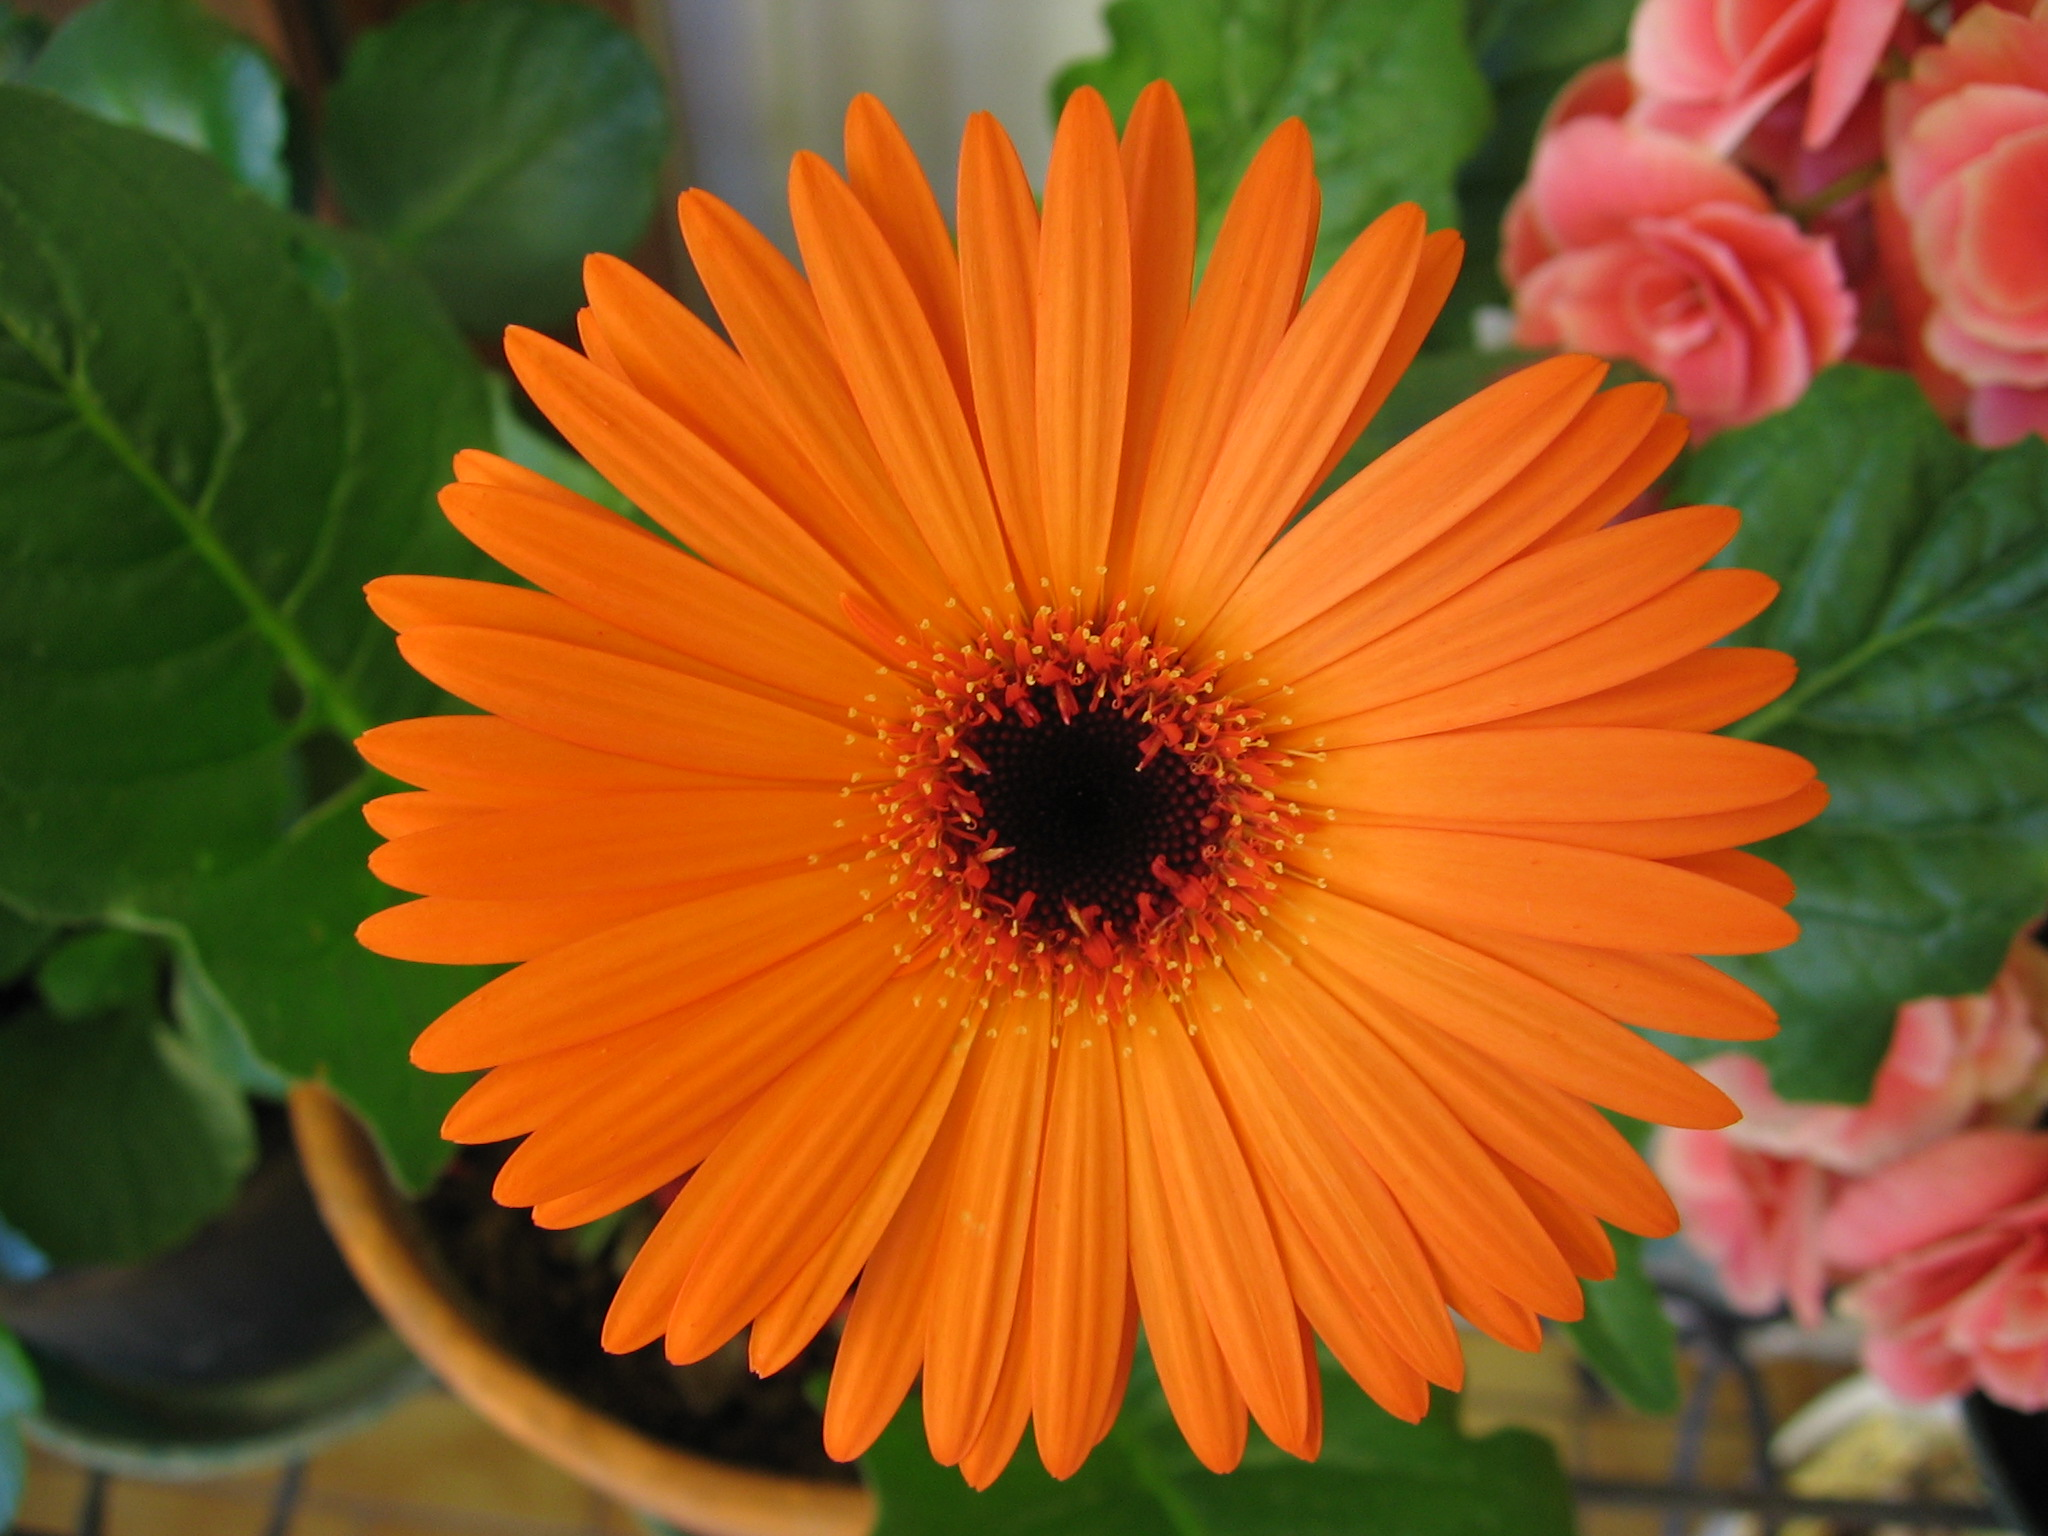 File:Orange gerbera.jpg - Wikimedia Commons